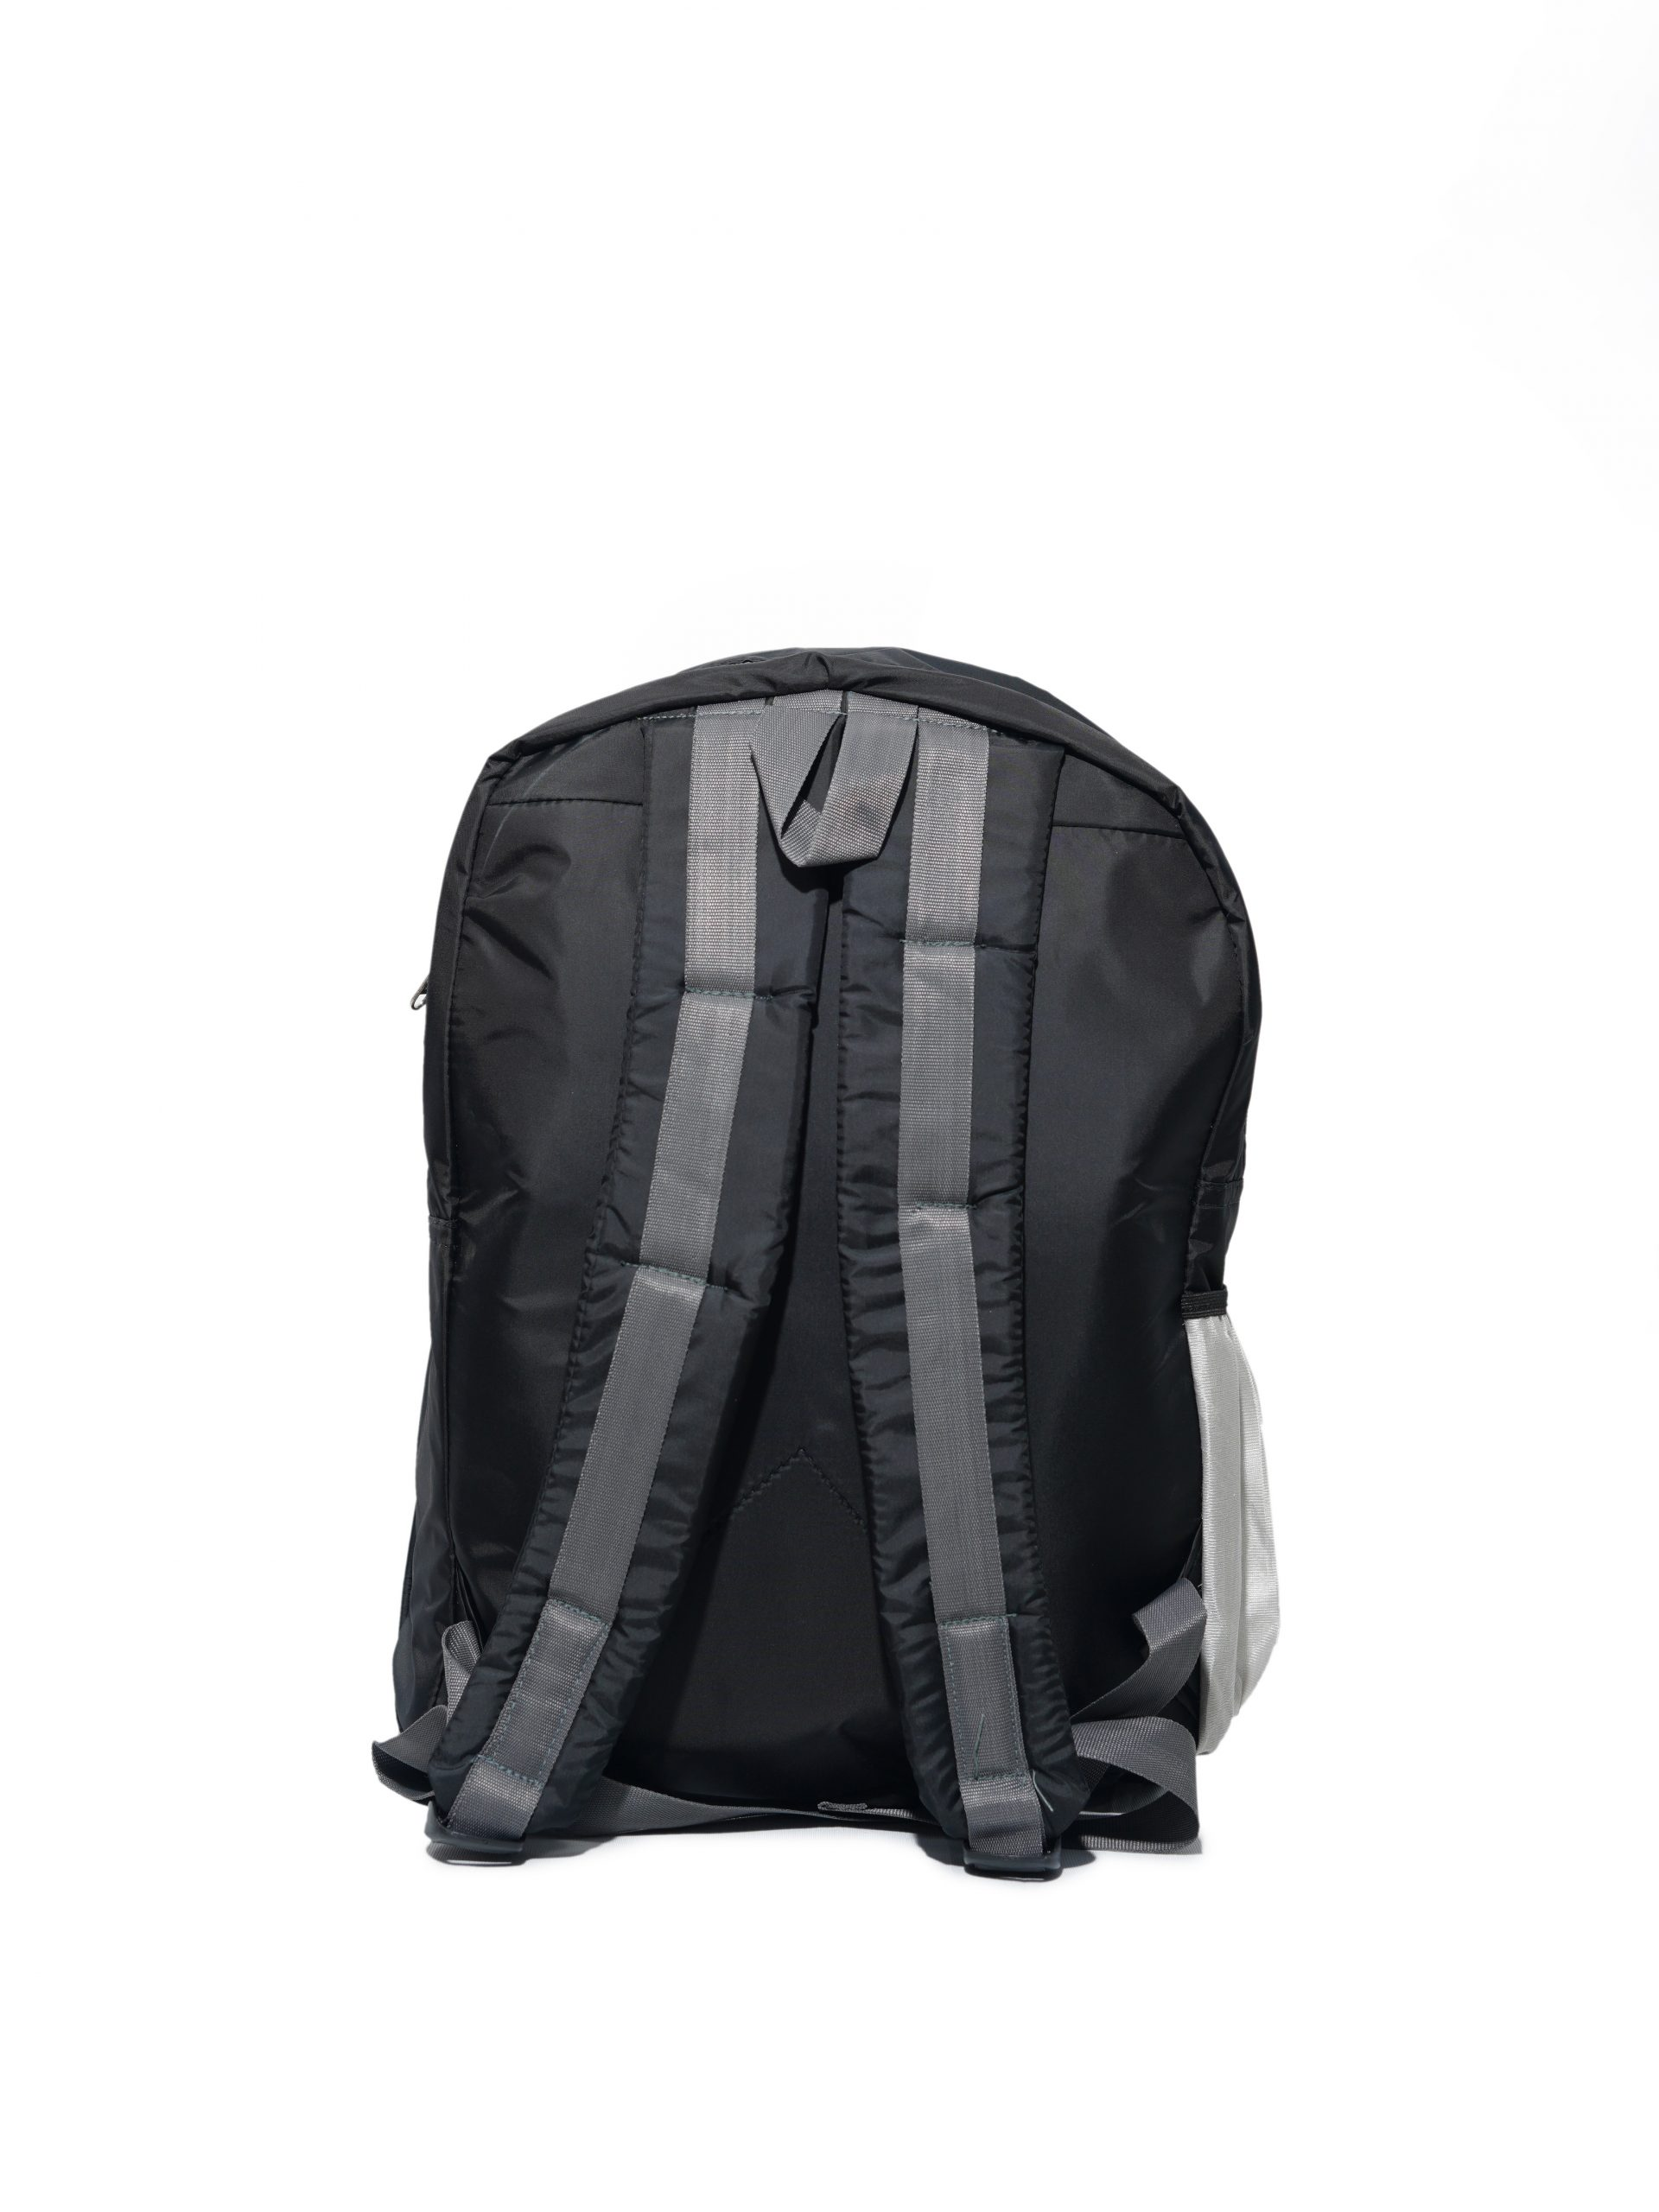 Back side of bag in white background